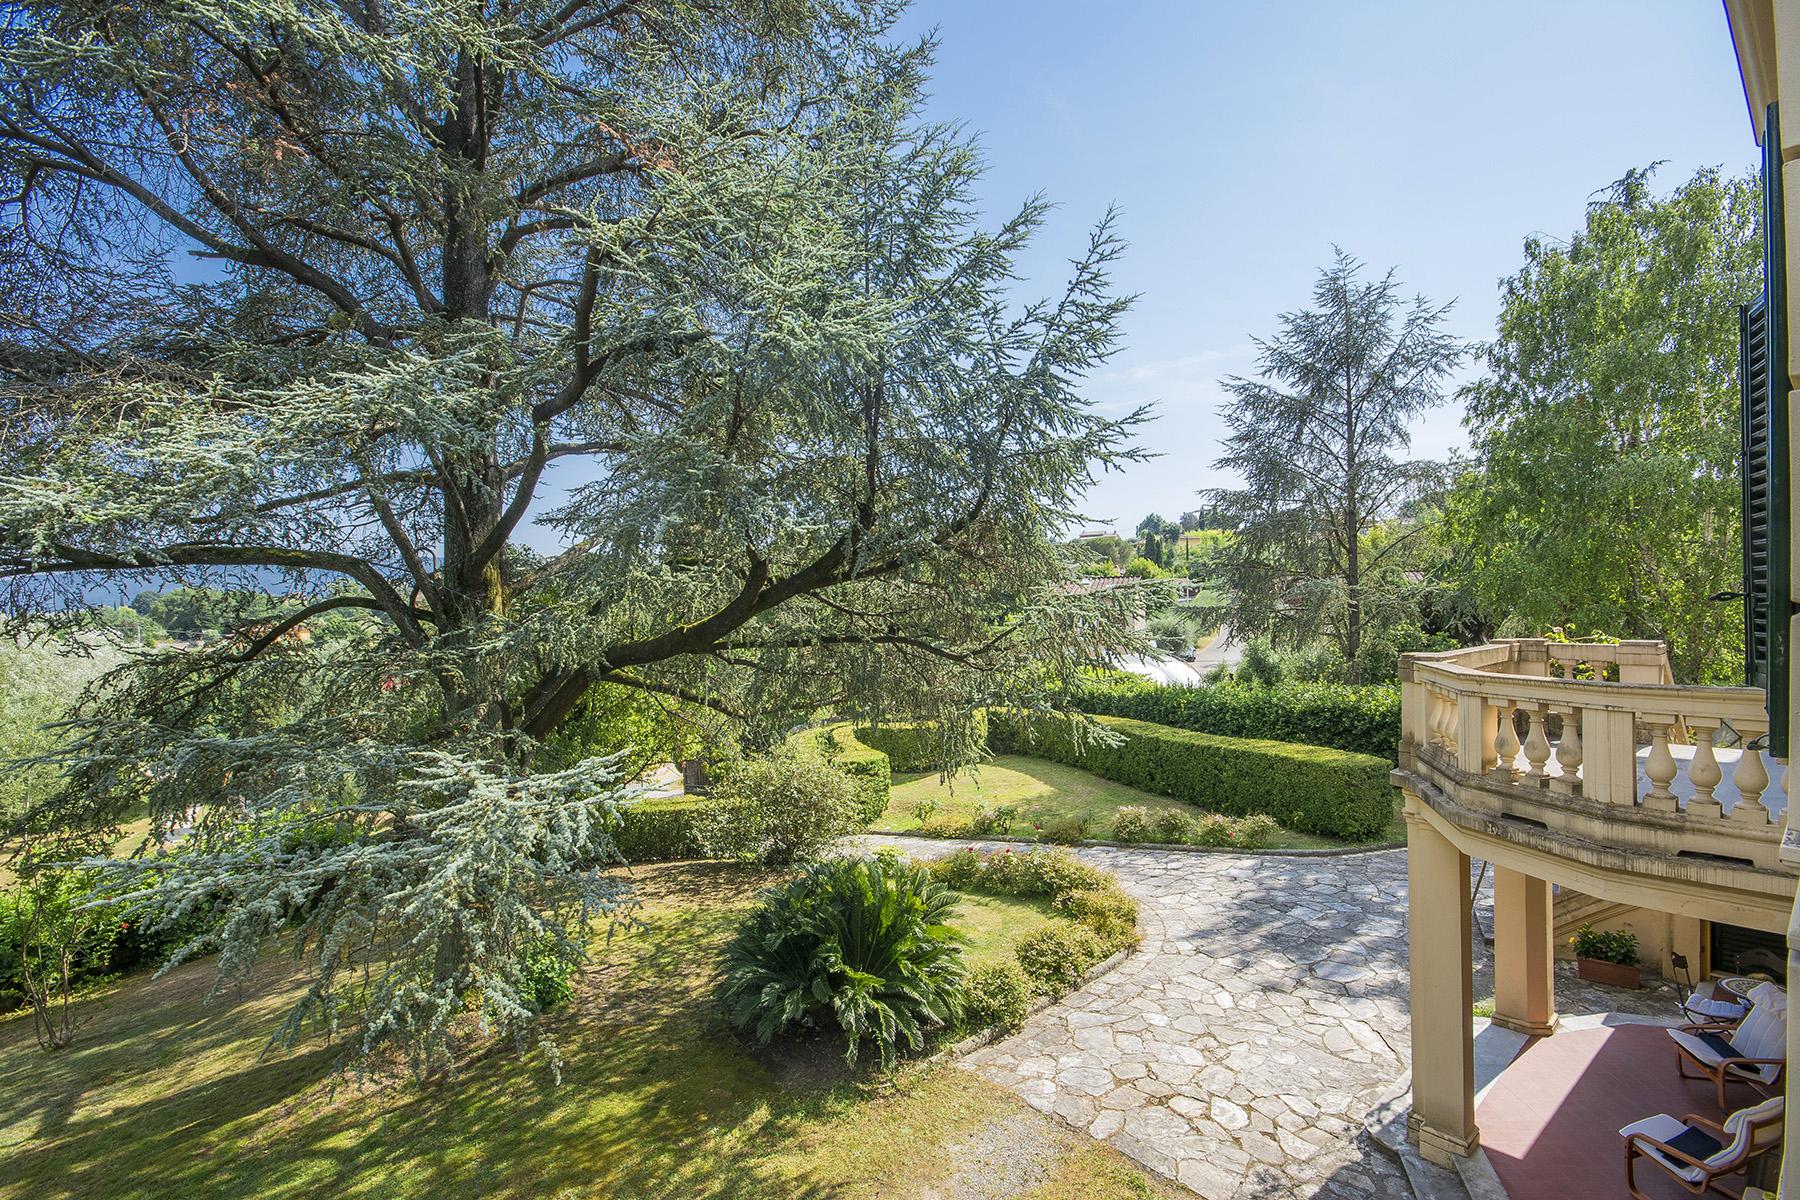 Villa in Vendita a Lucca: 5 locali, 1150 mq - Foto 29